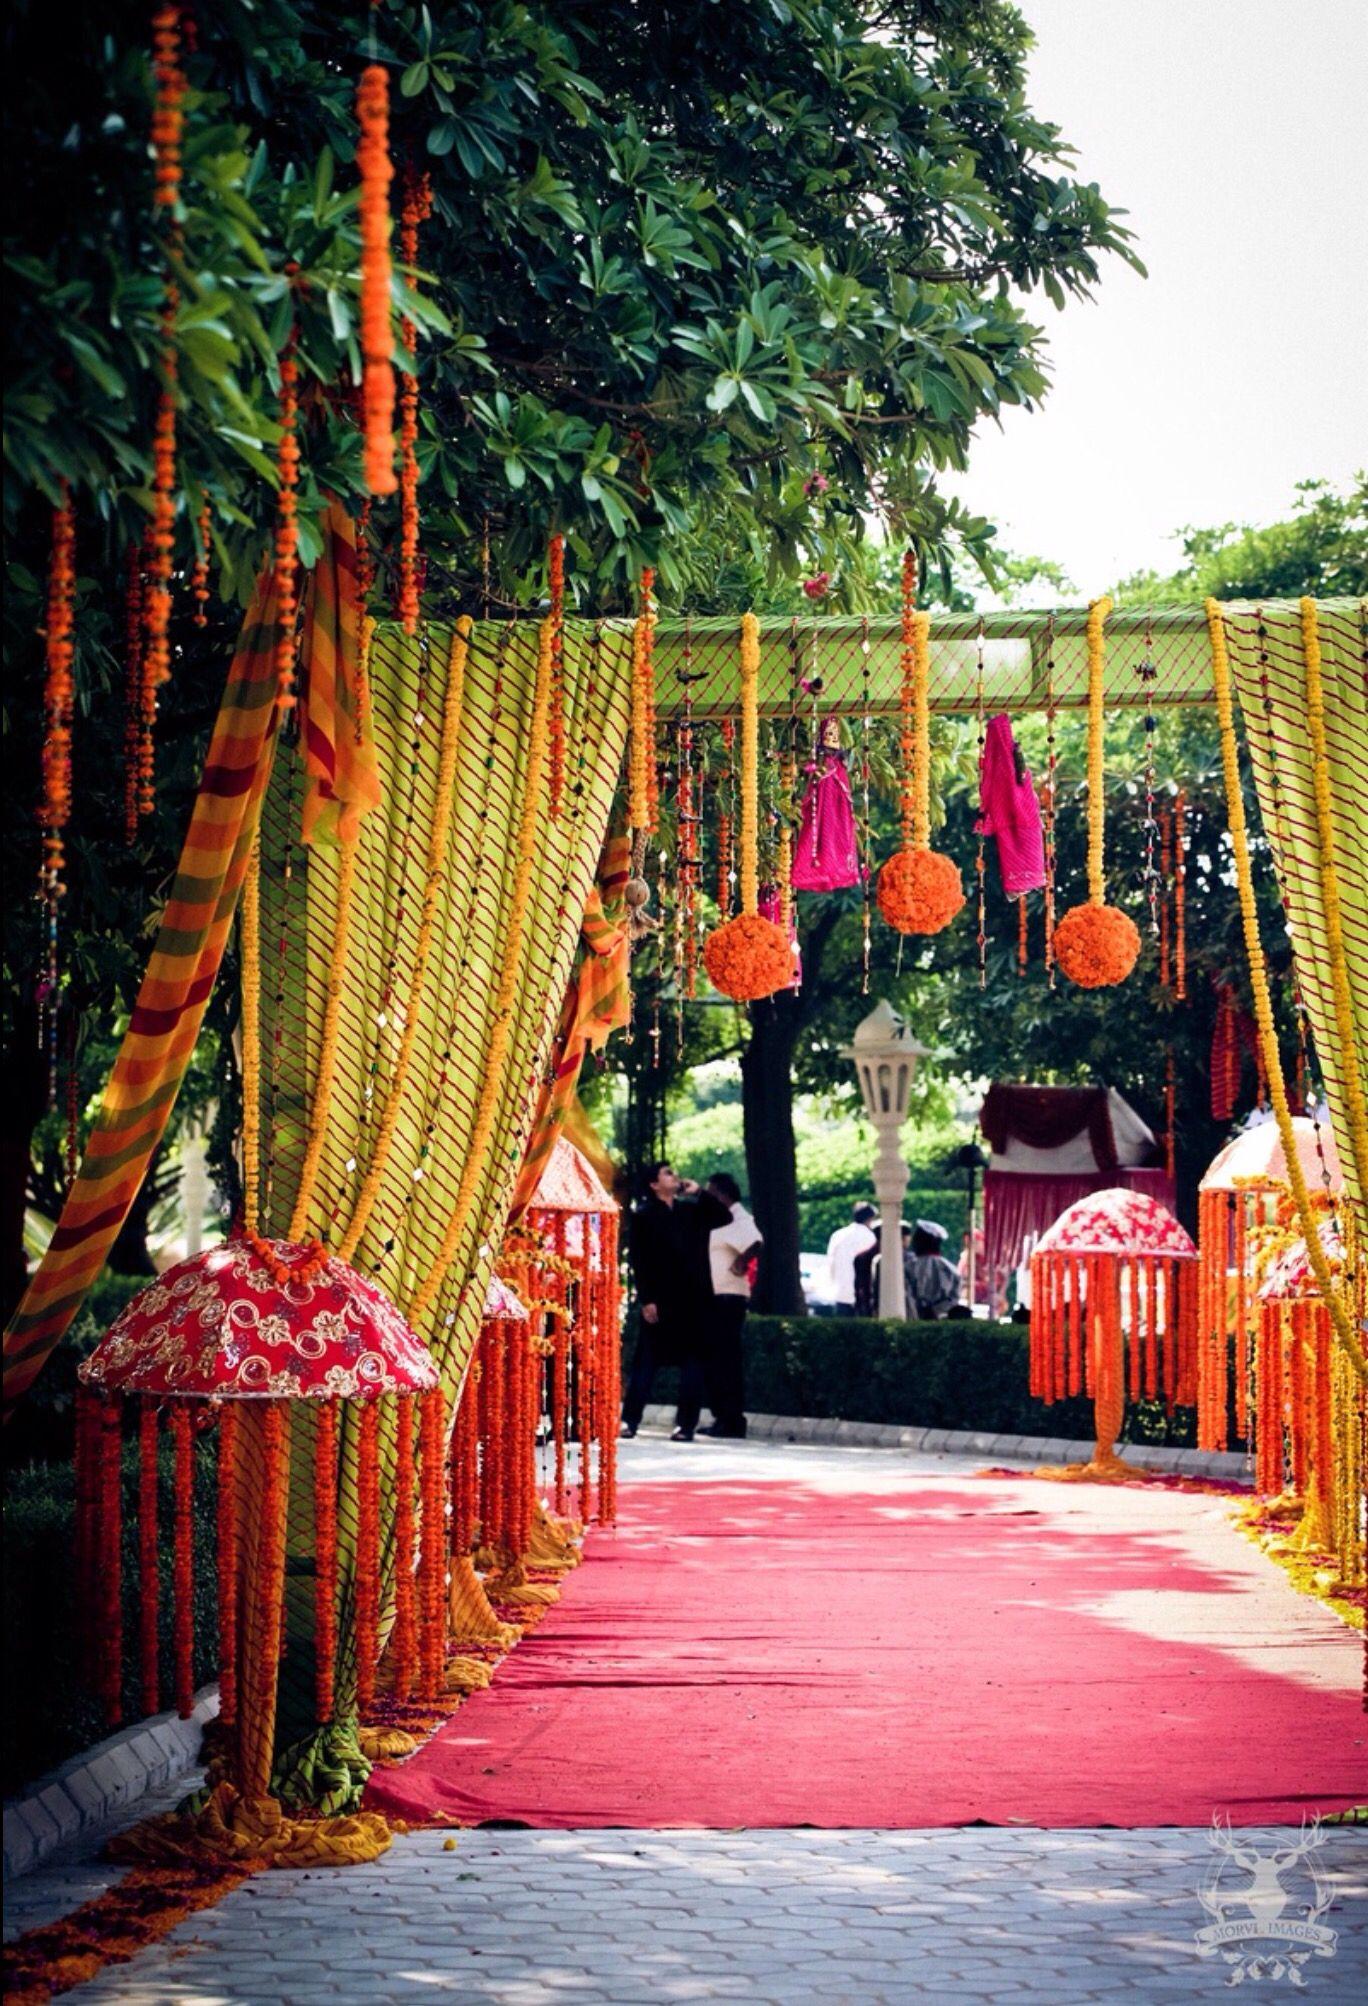 Wedding house decoration ideas  Pin by hanisha patel on MR u MRS PATEL   Pinterest  Wedding